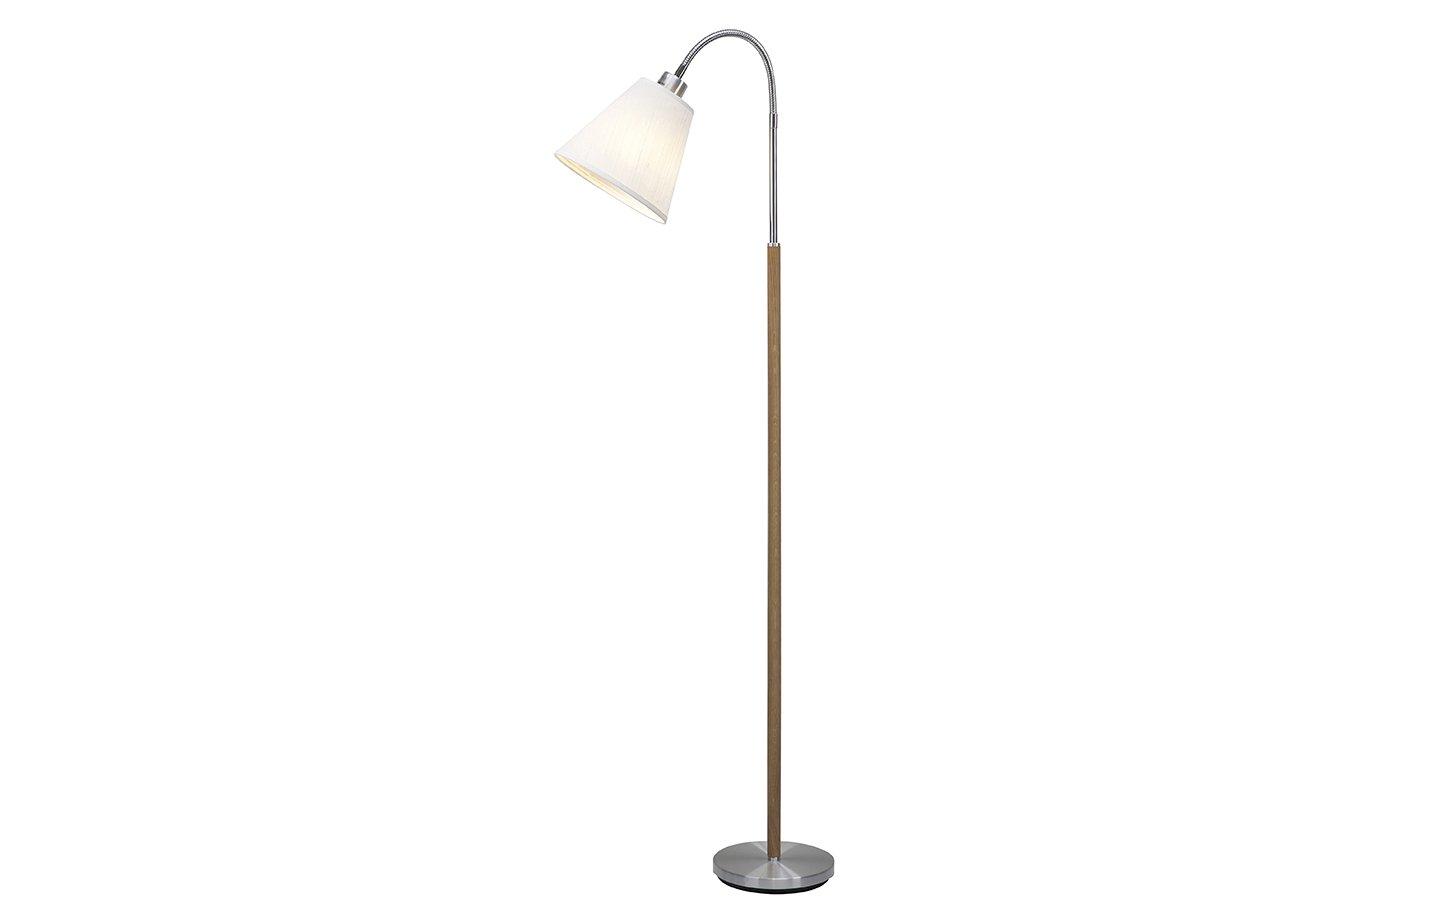 Sara single floor lamp fabiia dubai uae for Floor lamp dubai